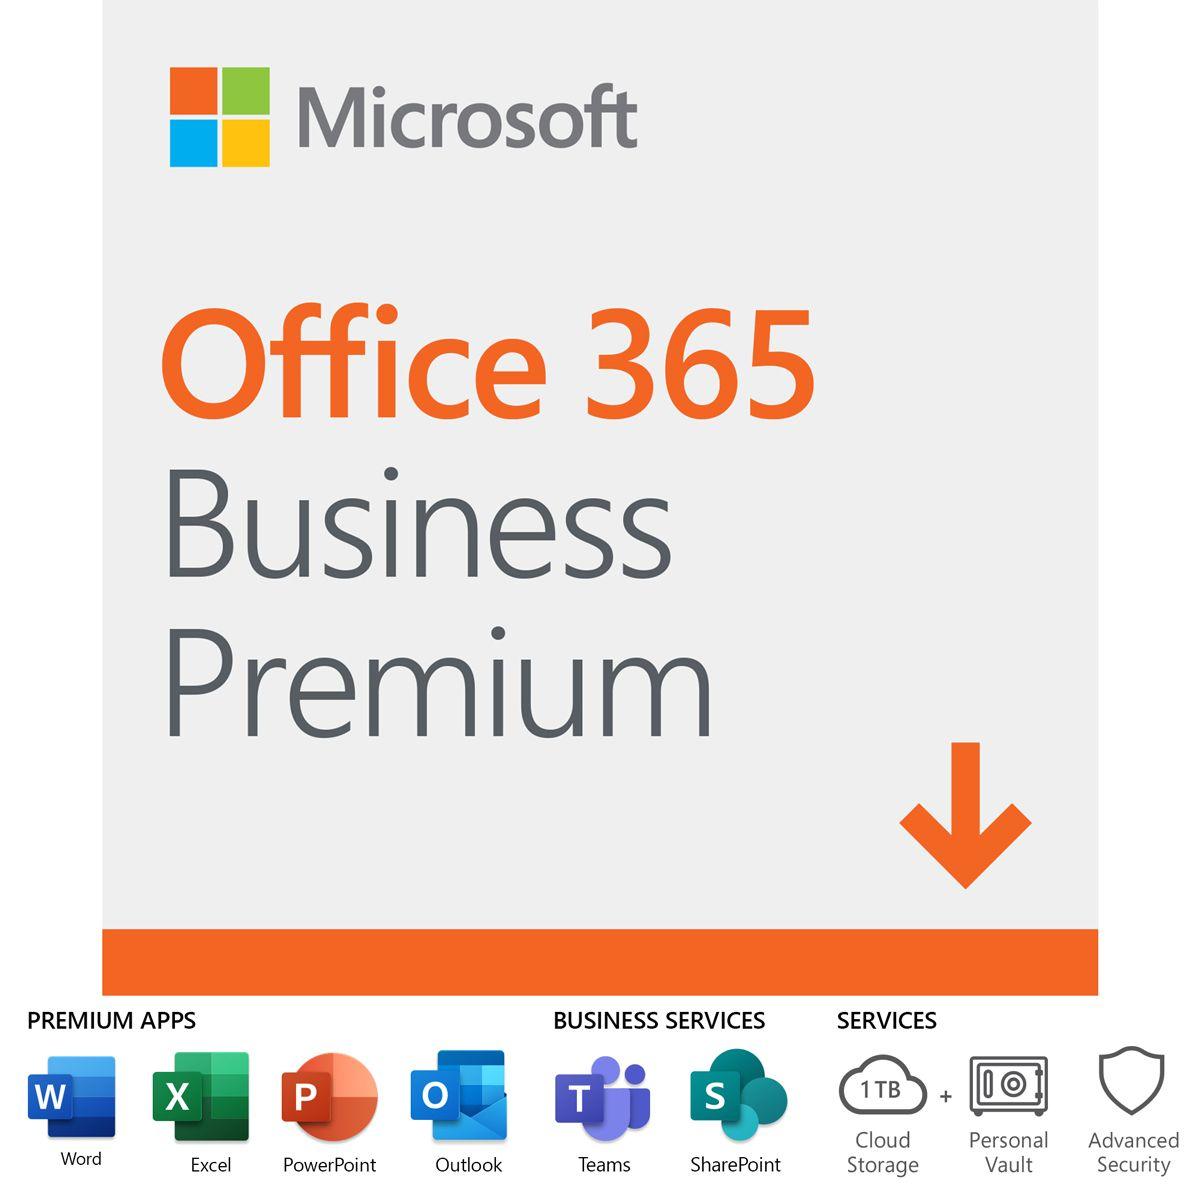 Microsoft Office 365 Businesspremium 12 Month Subscription 1 Person Pc Mac Download Klq 00218 Microsoft Office Office 365 Microsoft Microsoft 365 online sign in